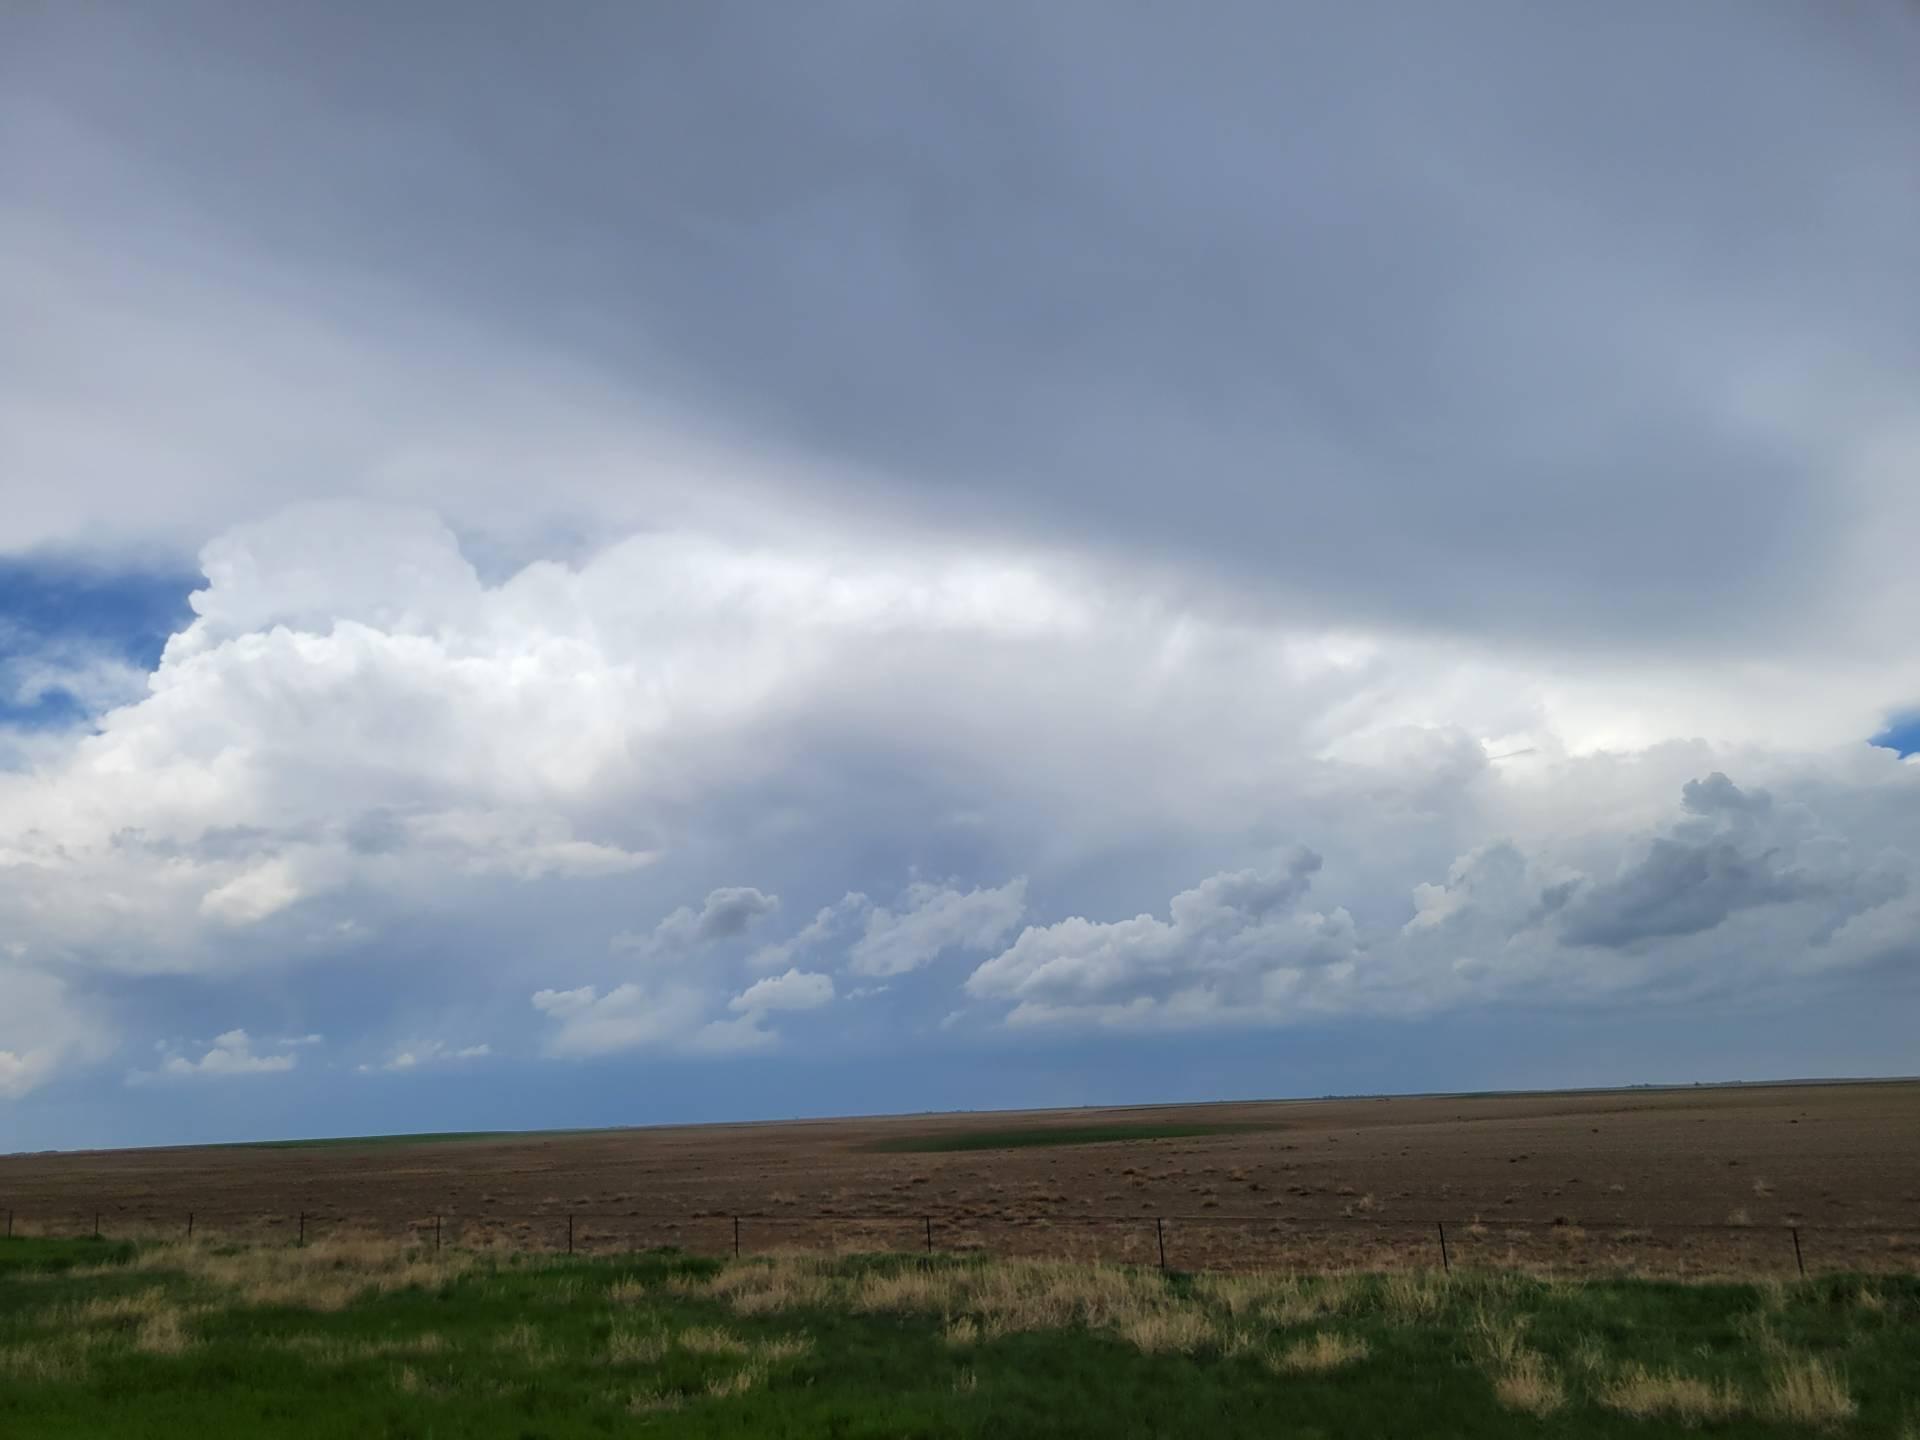 Storms developing over Anton, Colorado. #cowx